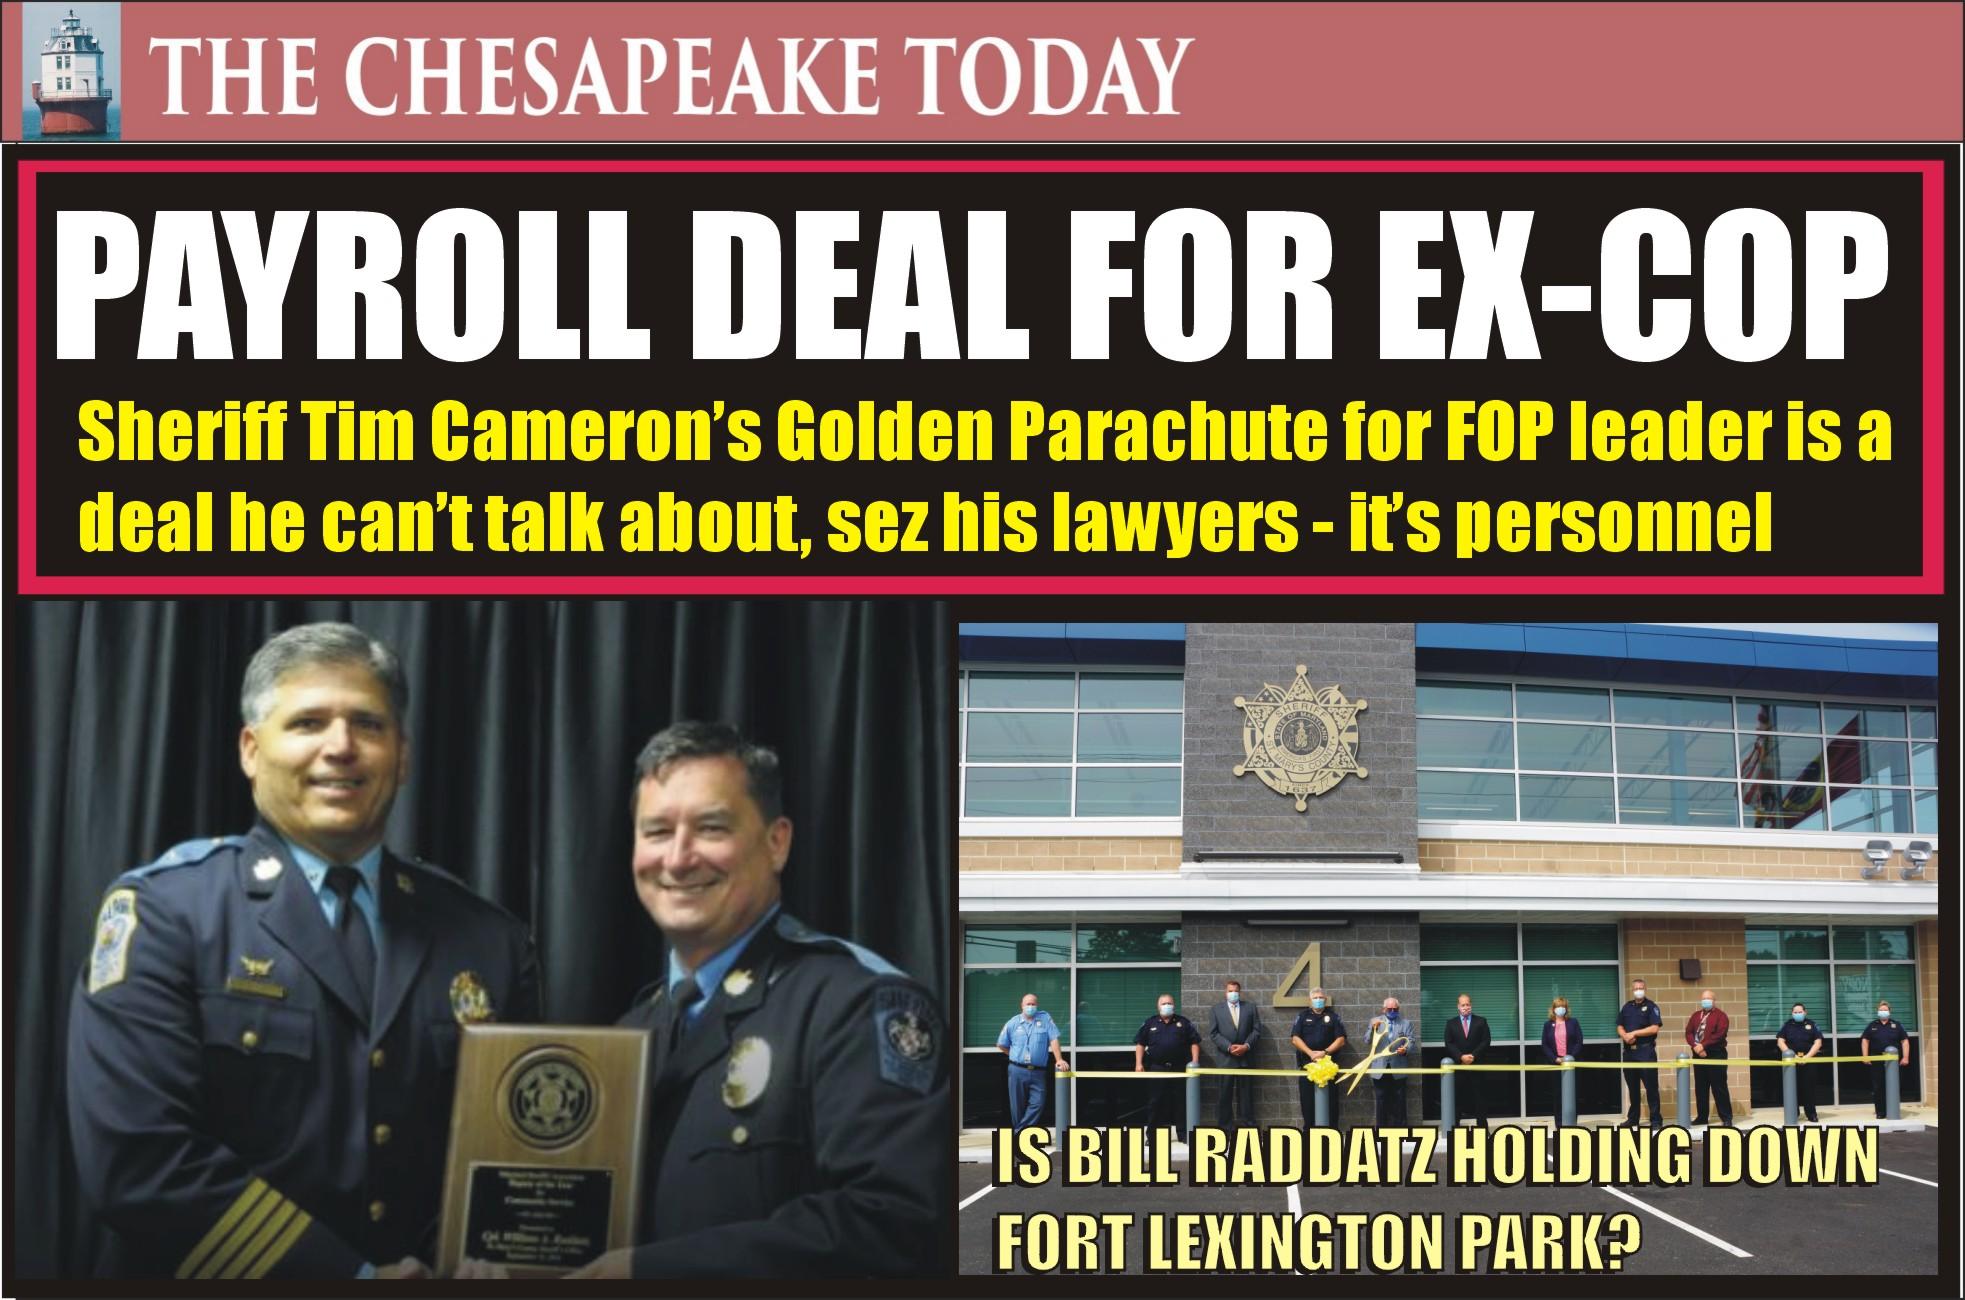 SHERIFF CAMERON REMOVES POLICE POWERS OF SGT. BILL RADDATZ; BUT KEEPS DEFROCKED SAINT MARYS DEPUTY ON THE JOB